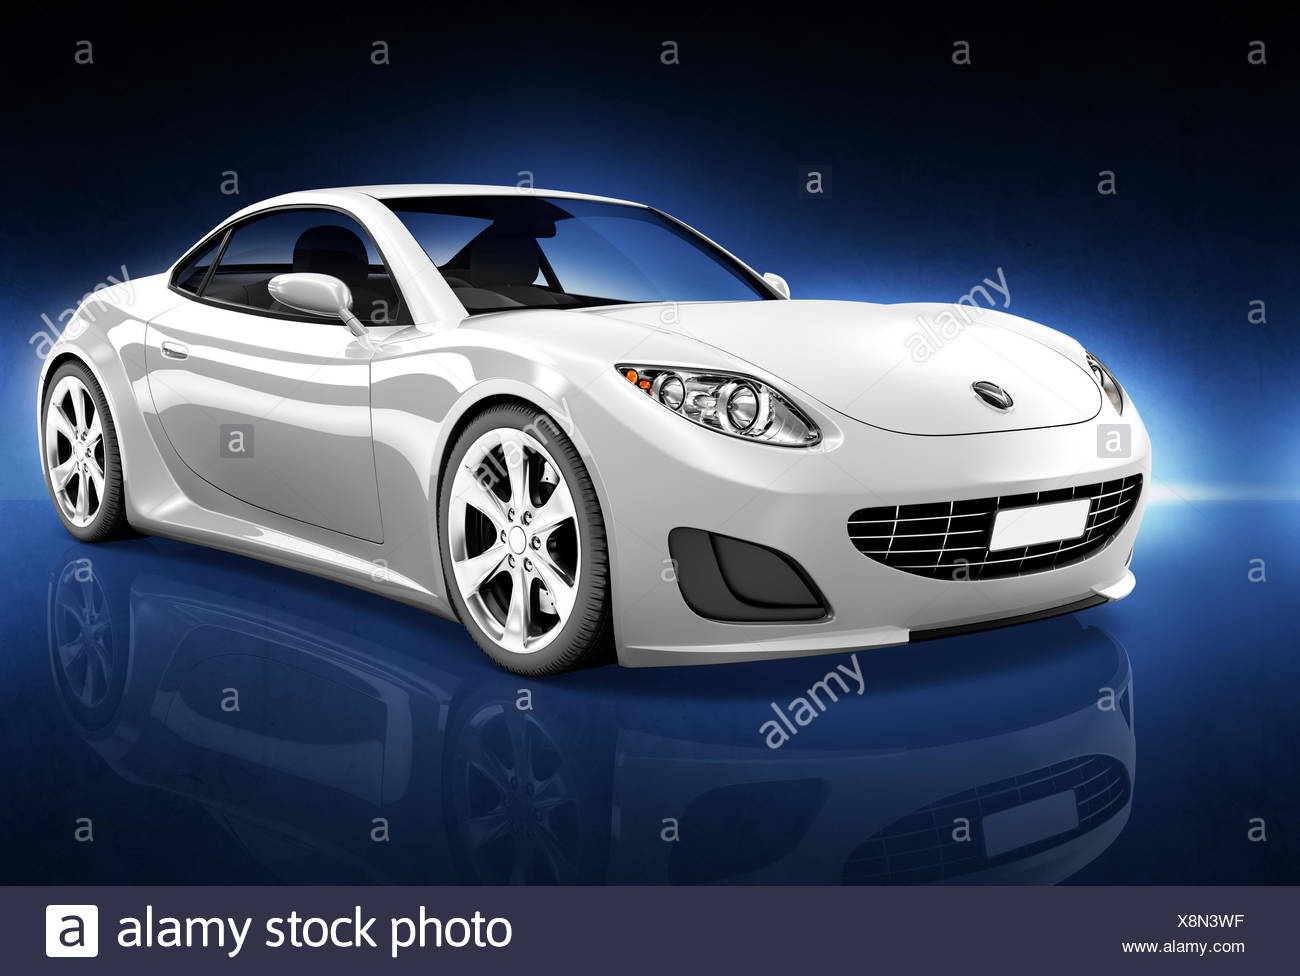 Comtemporary Car Elegance Vehicle Transportation Luxury Performance Concept - Stock Image